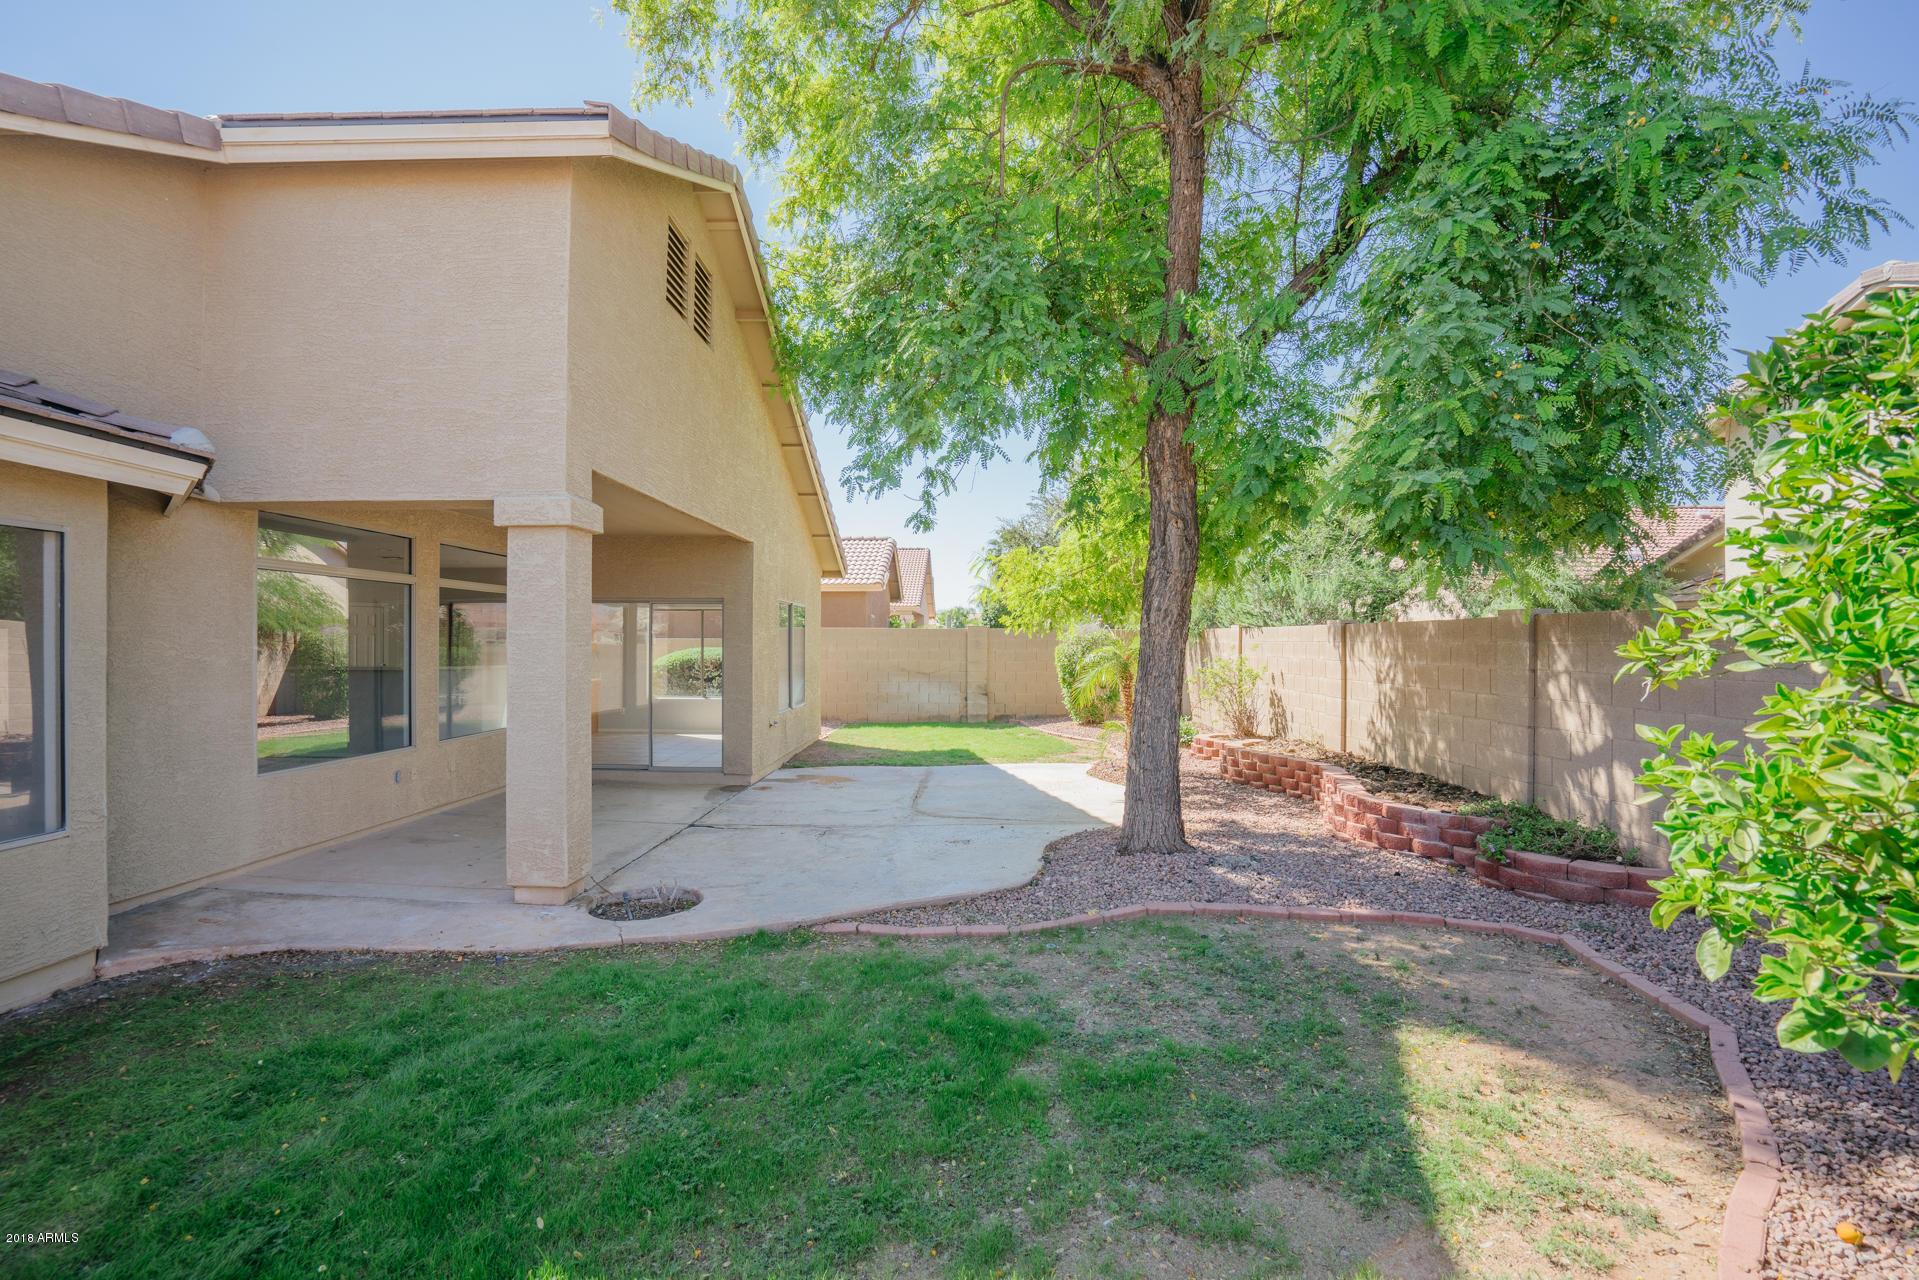 MLS 5831976 12414 N 128TH Avenue, El Mirage, AZ 85335 El Mirage AZ Three Bedroom